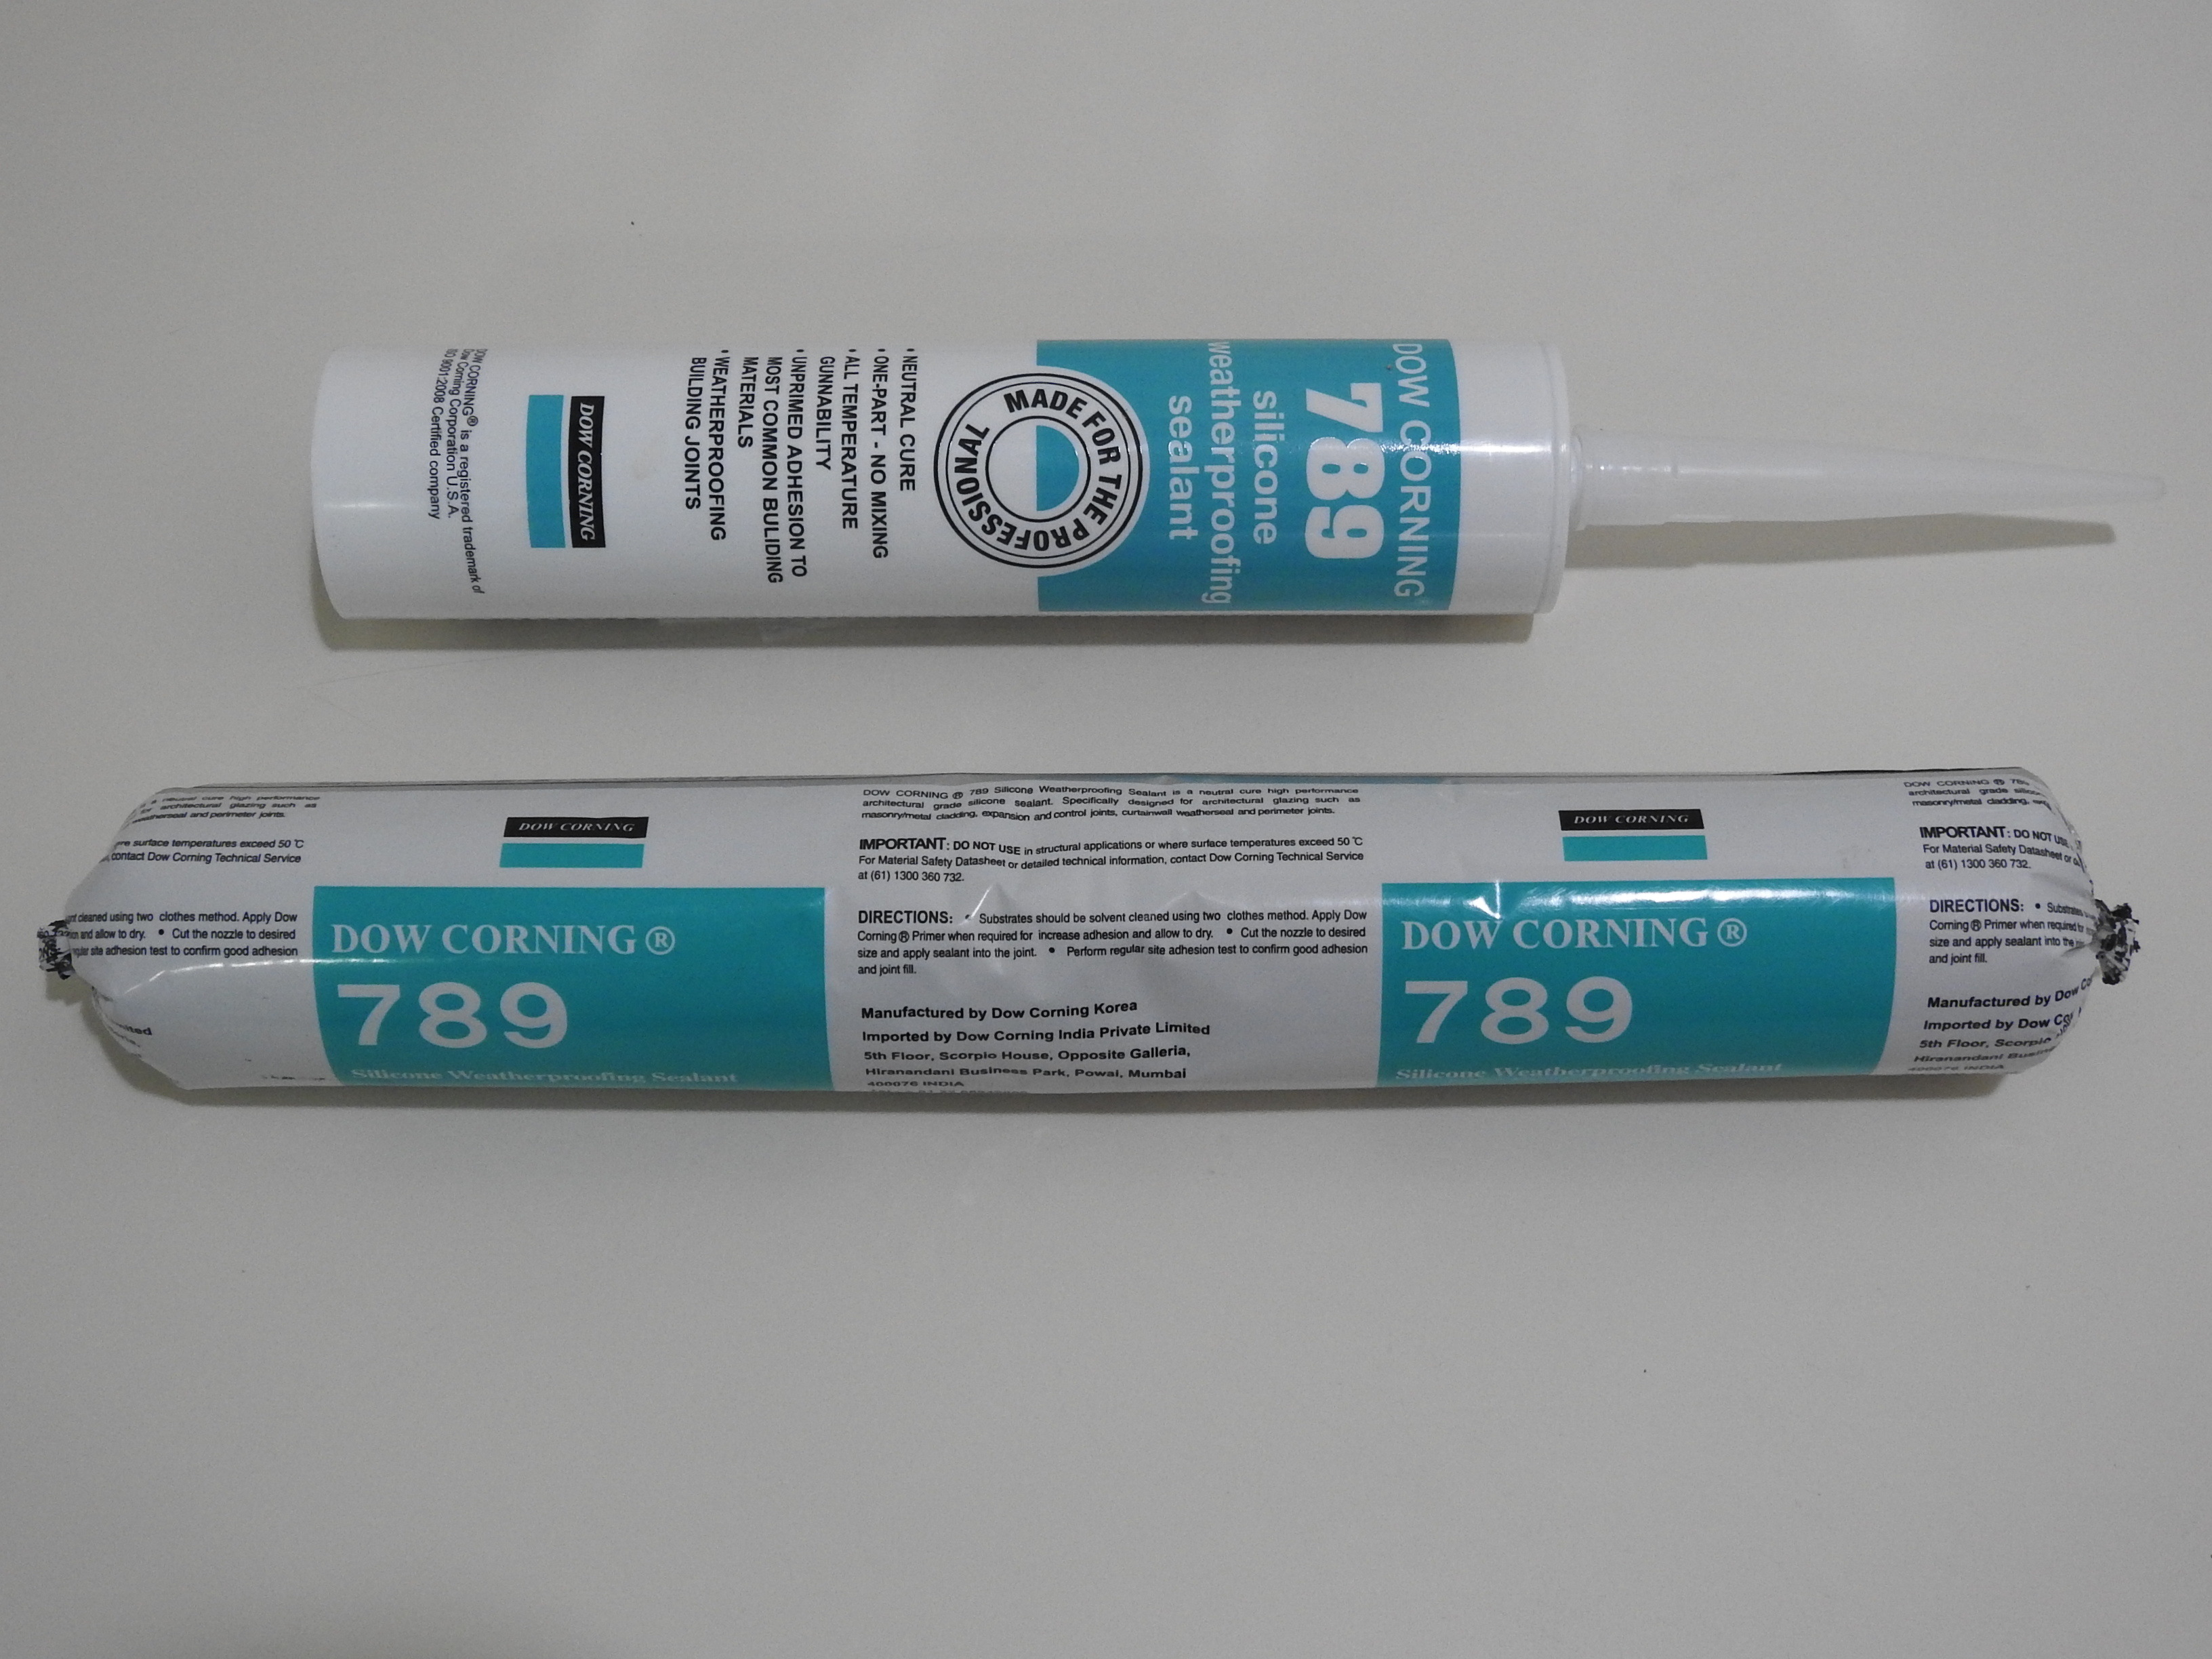 DOWSIL 789 Silicone Weatherproofing Sealant